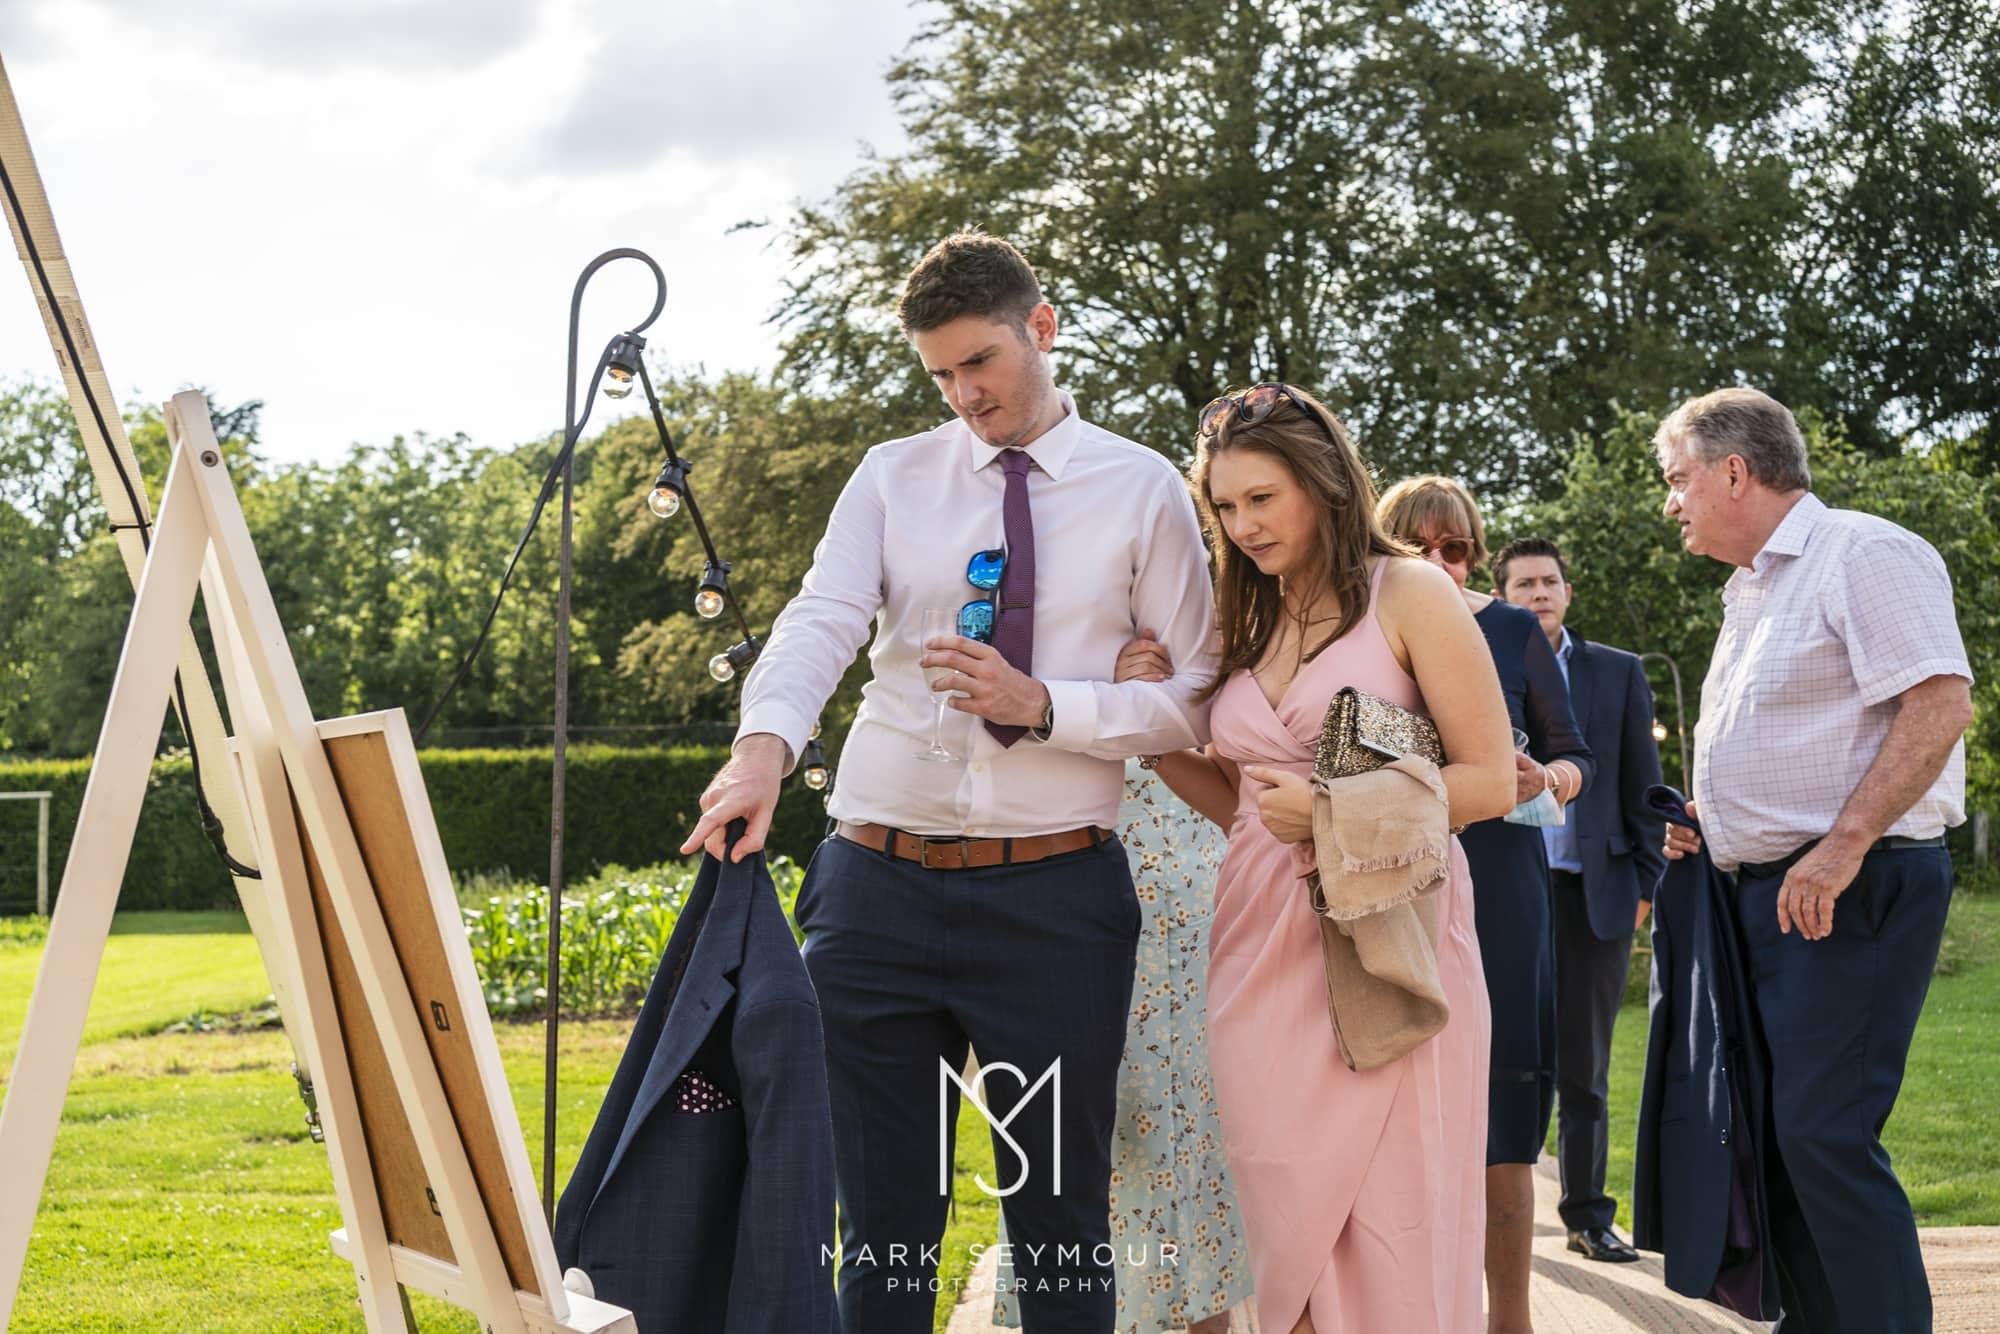 Barnsley House Wedding Photographer - Olivia and James' wedding 22